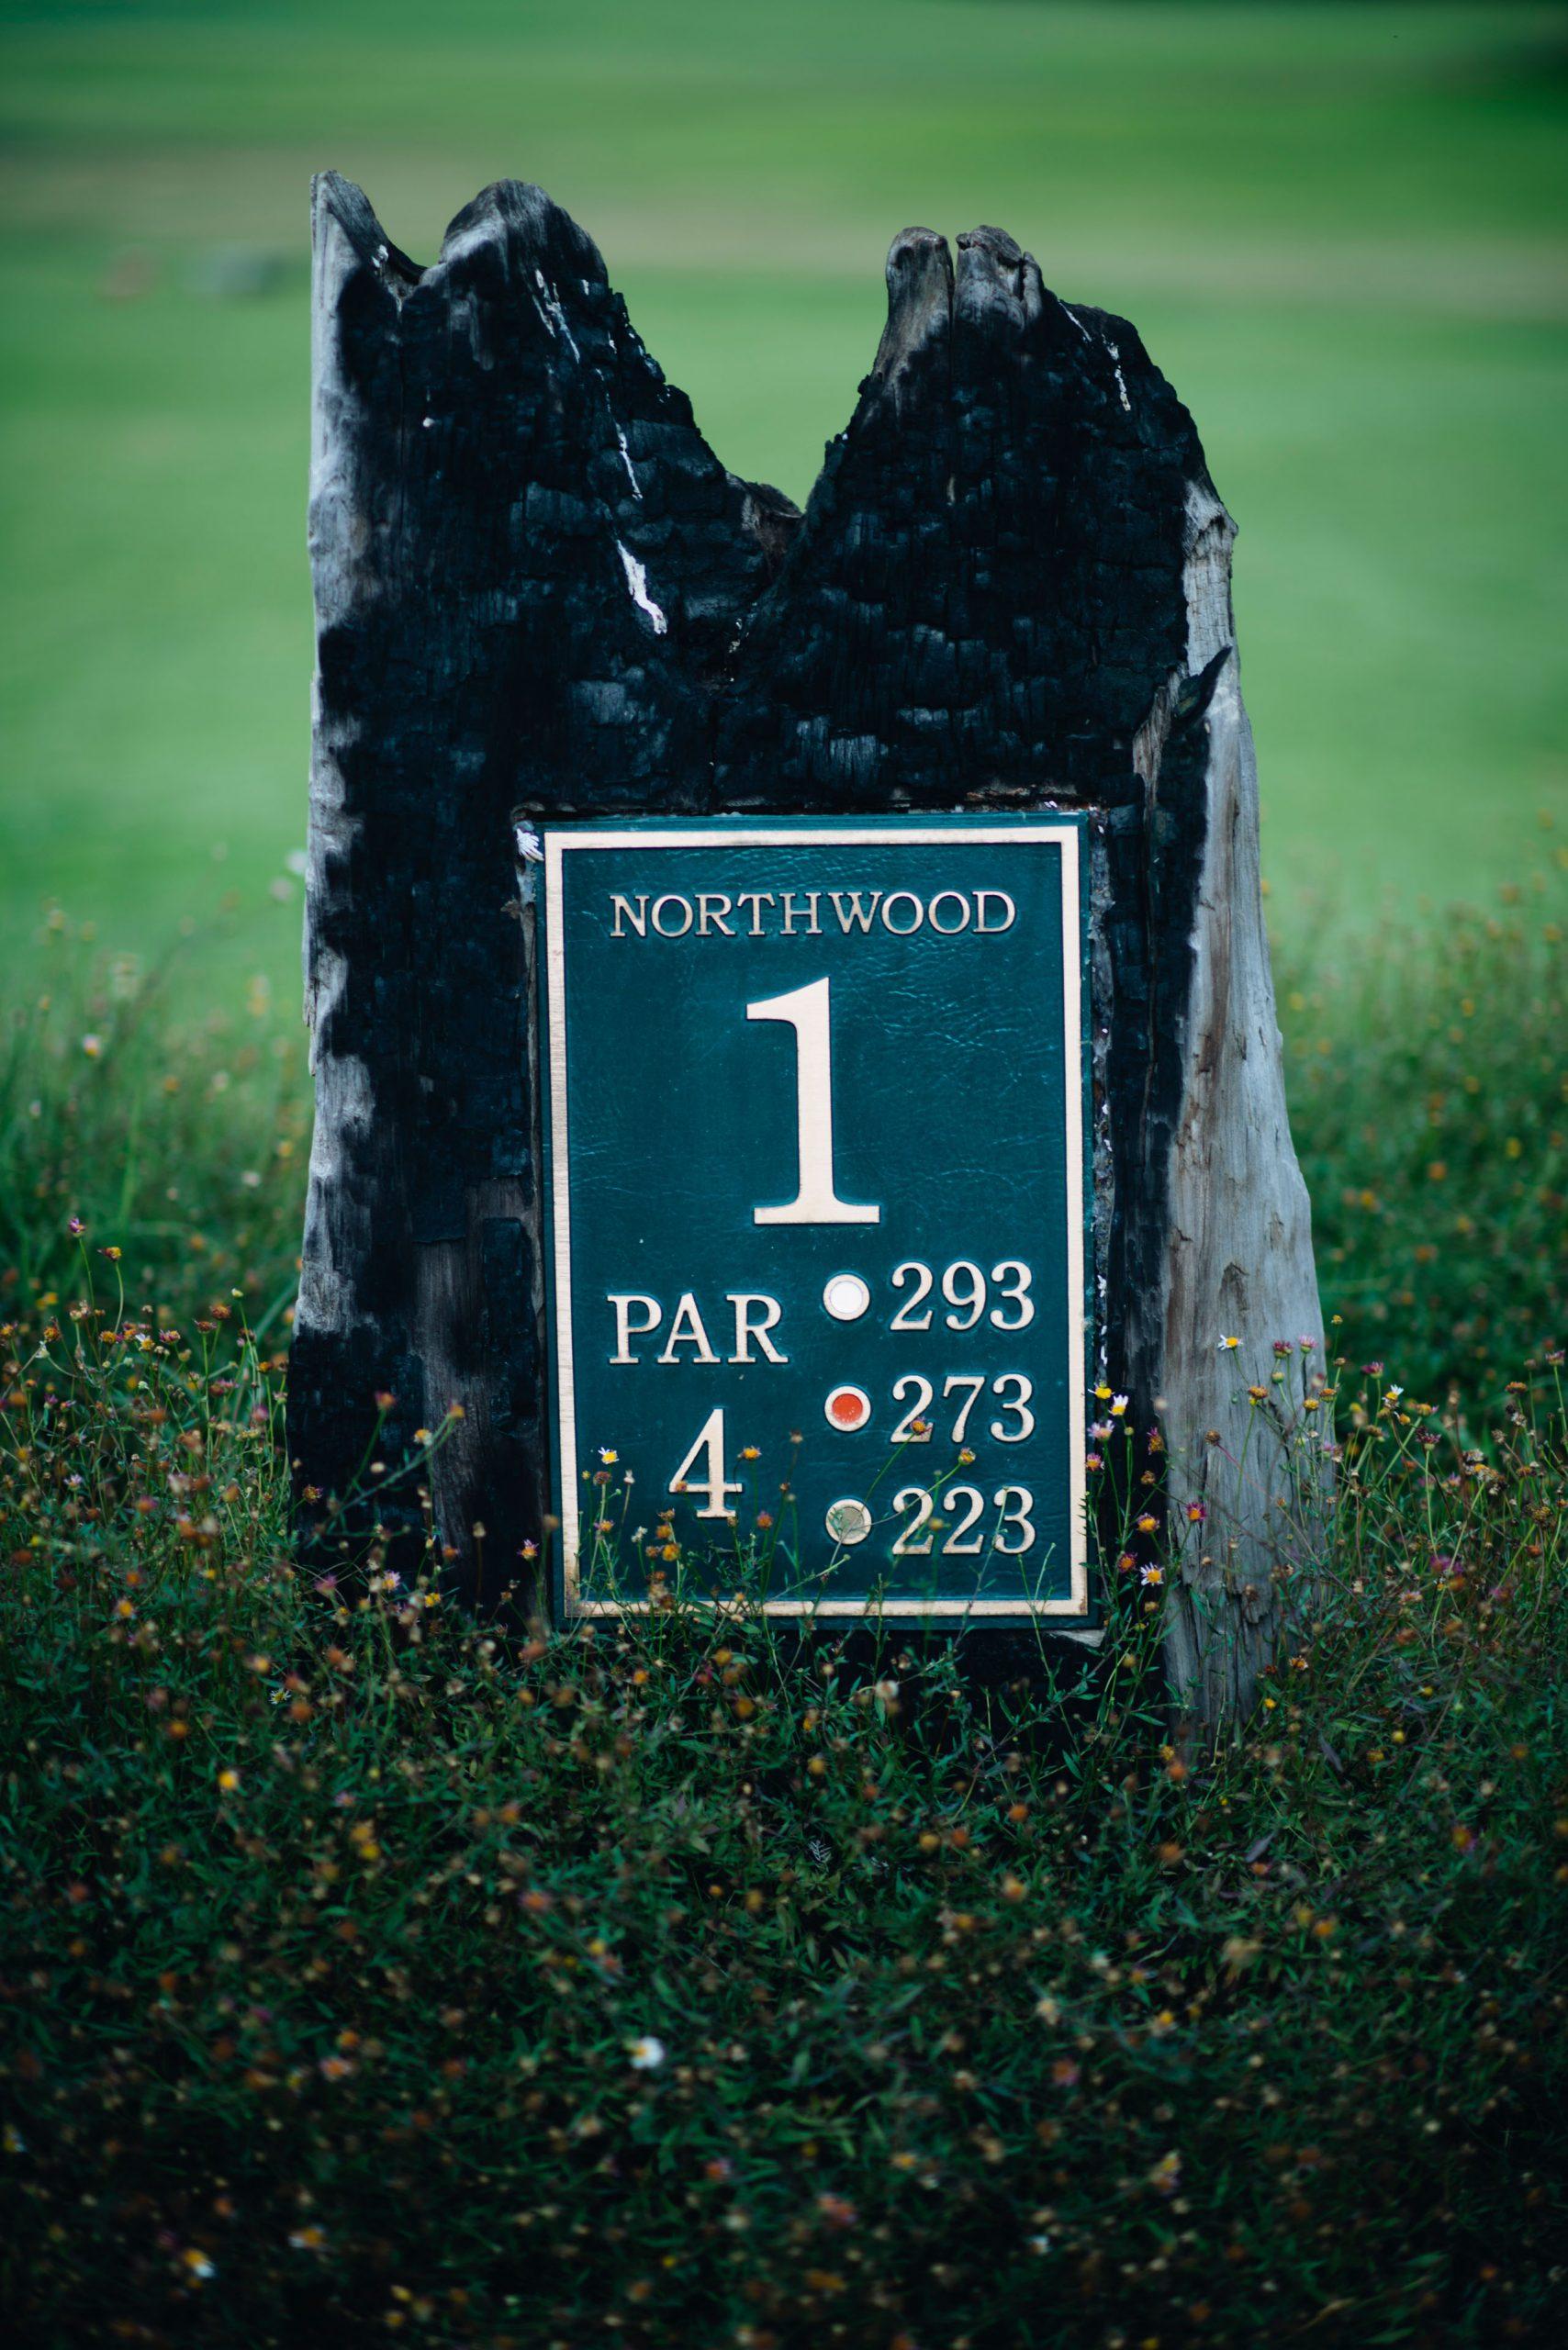 Northwood Golf Club. Photo by Kohjiro Kinno